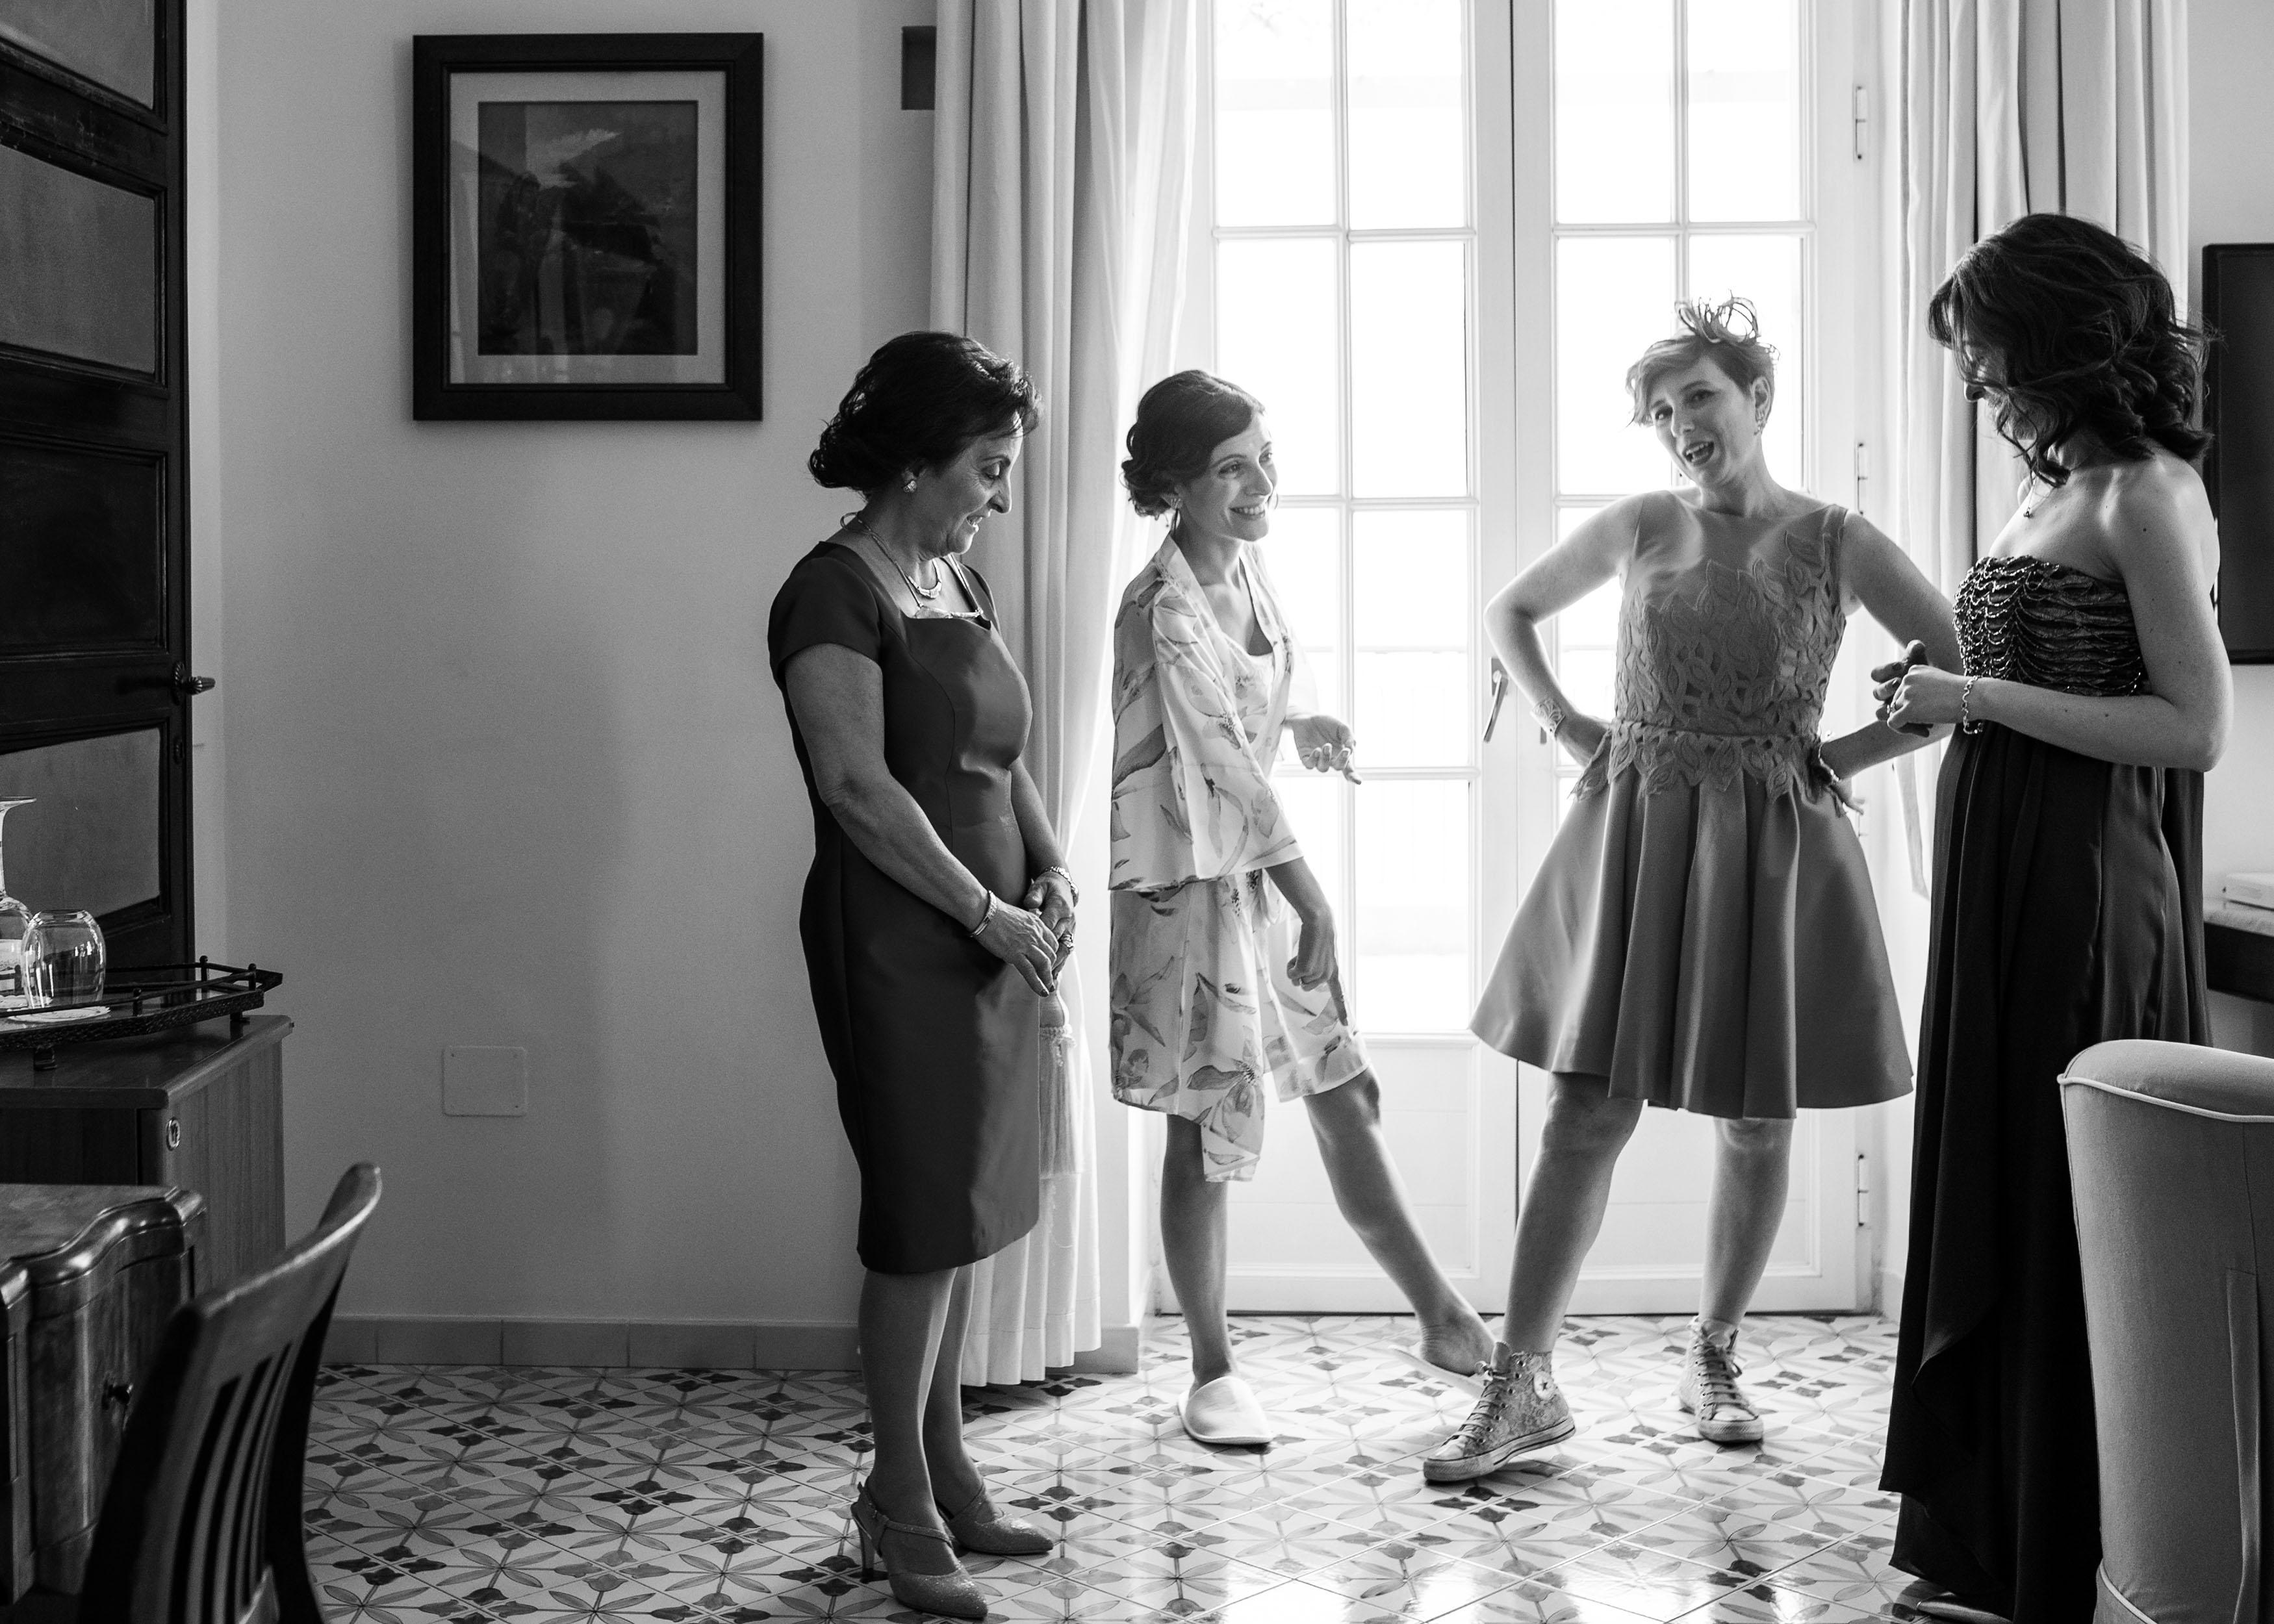 http://www.weddingamalfi.com/wp-content/uploads/Katia-Jorge-18-maggio-2019-13.jpg